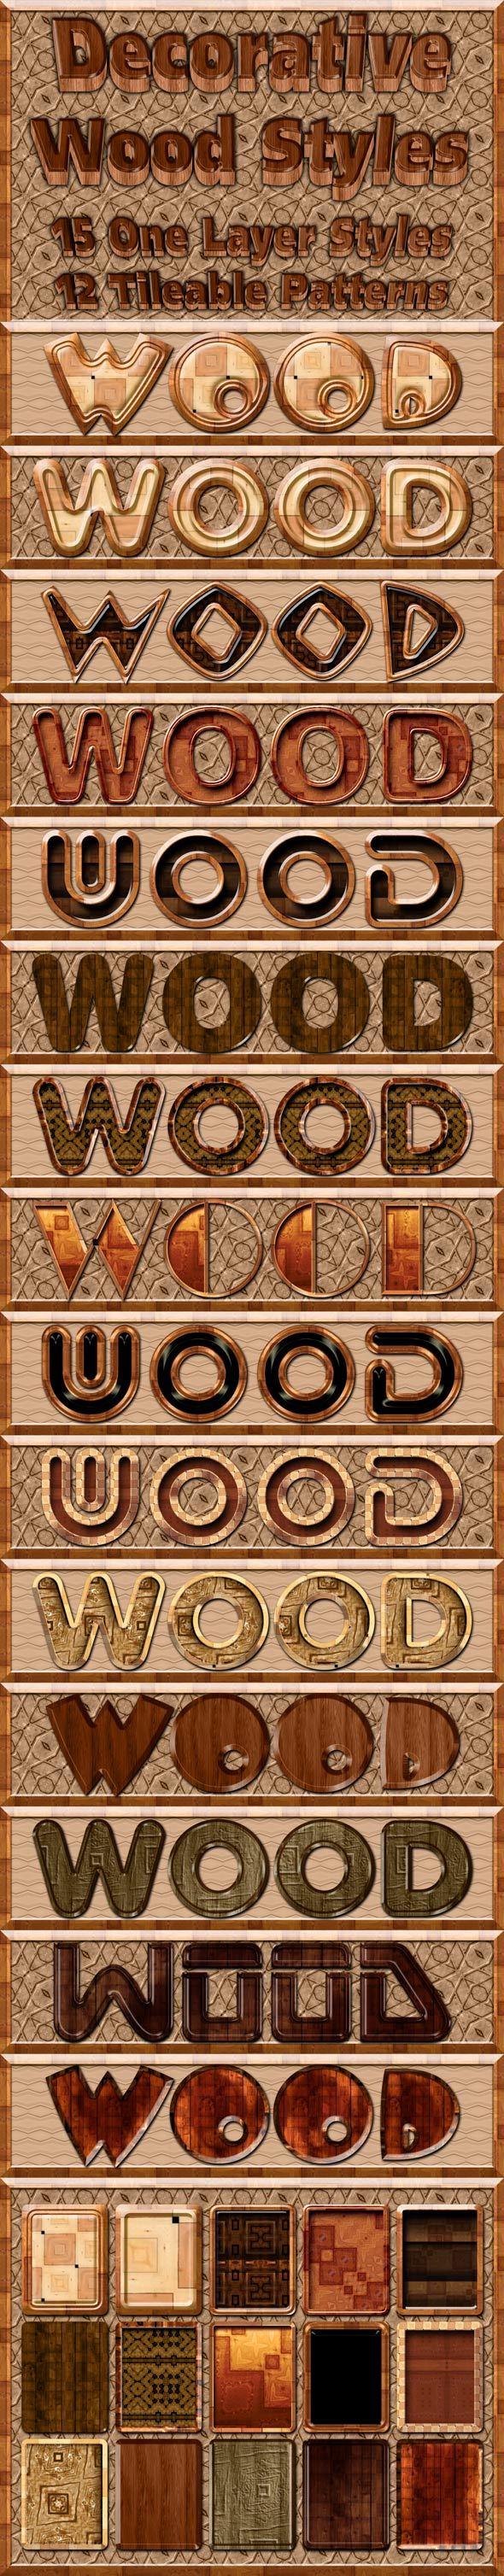 Decorative Wood Styles